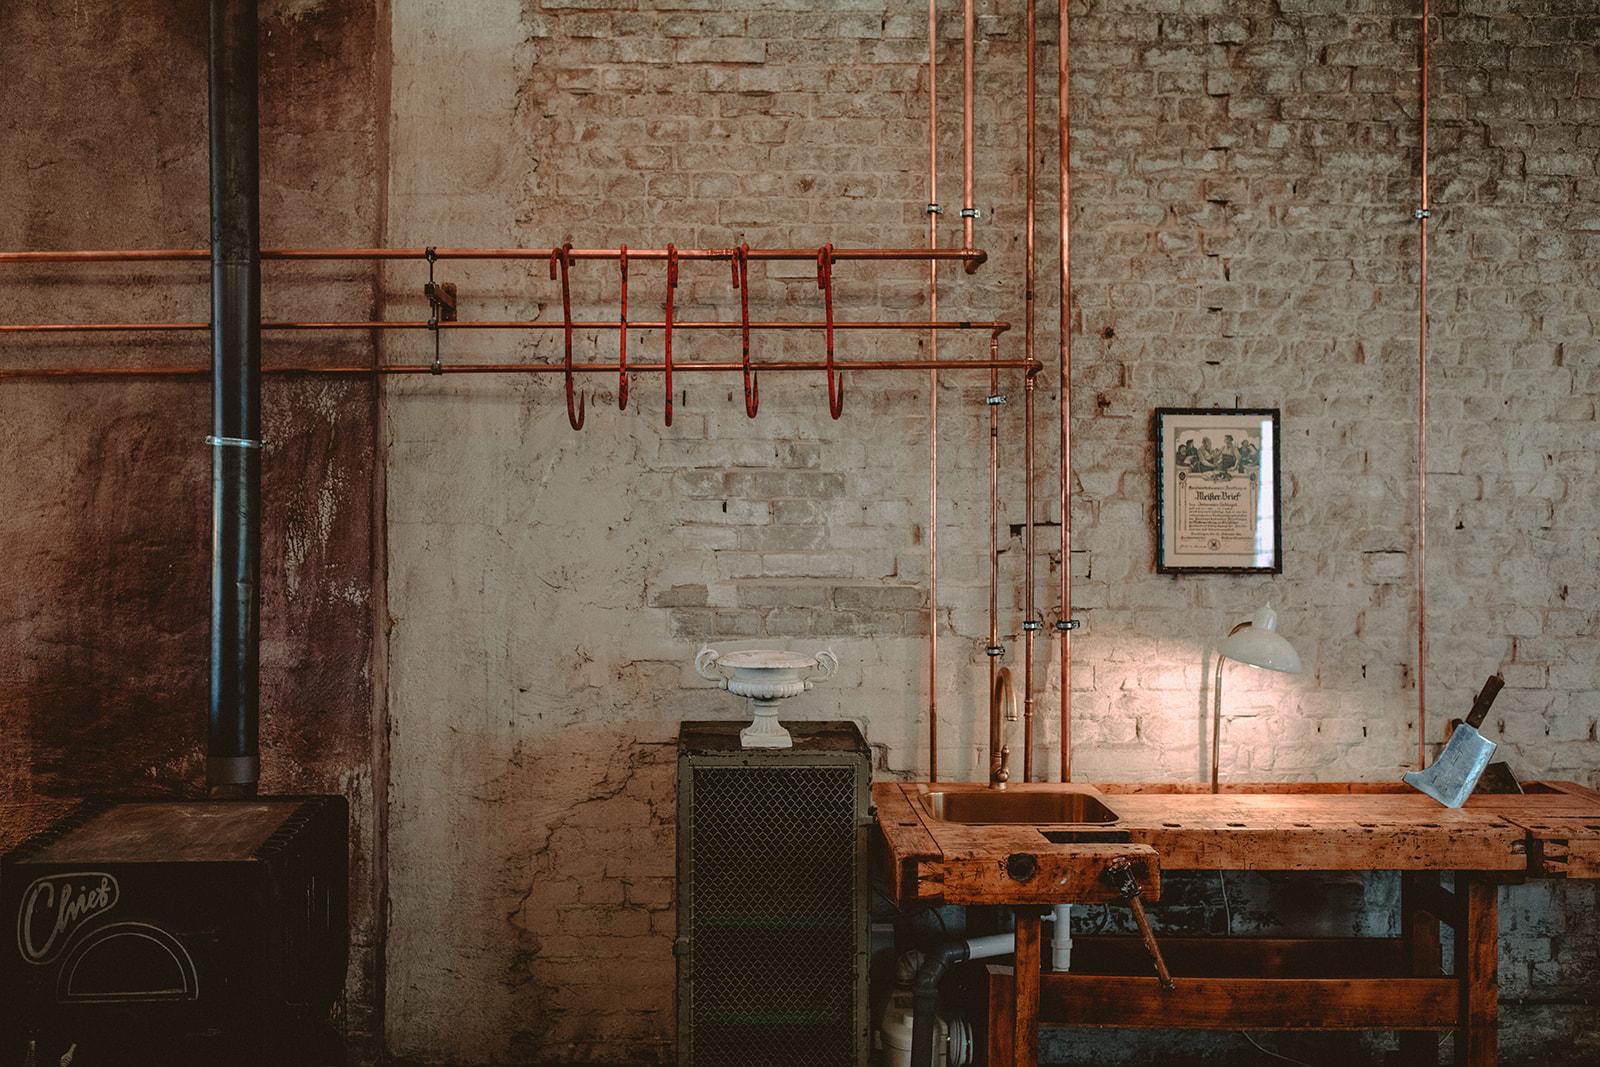 Fabrik23_LaCucina_by_BringMeSomewhereNice_0711.jpg